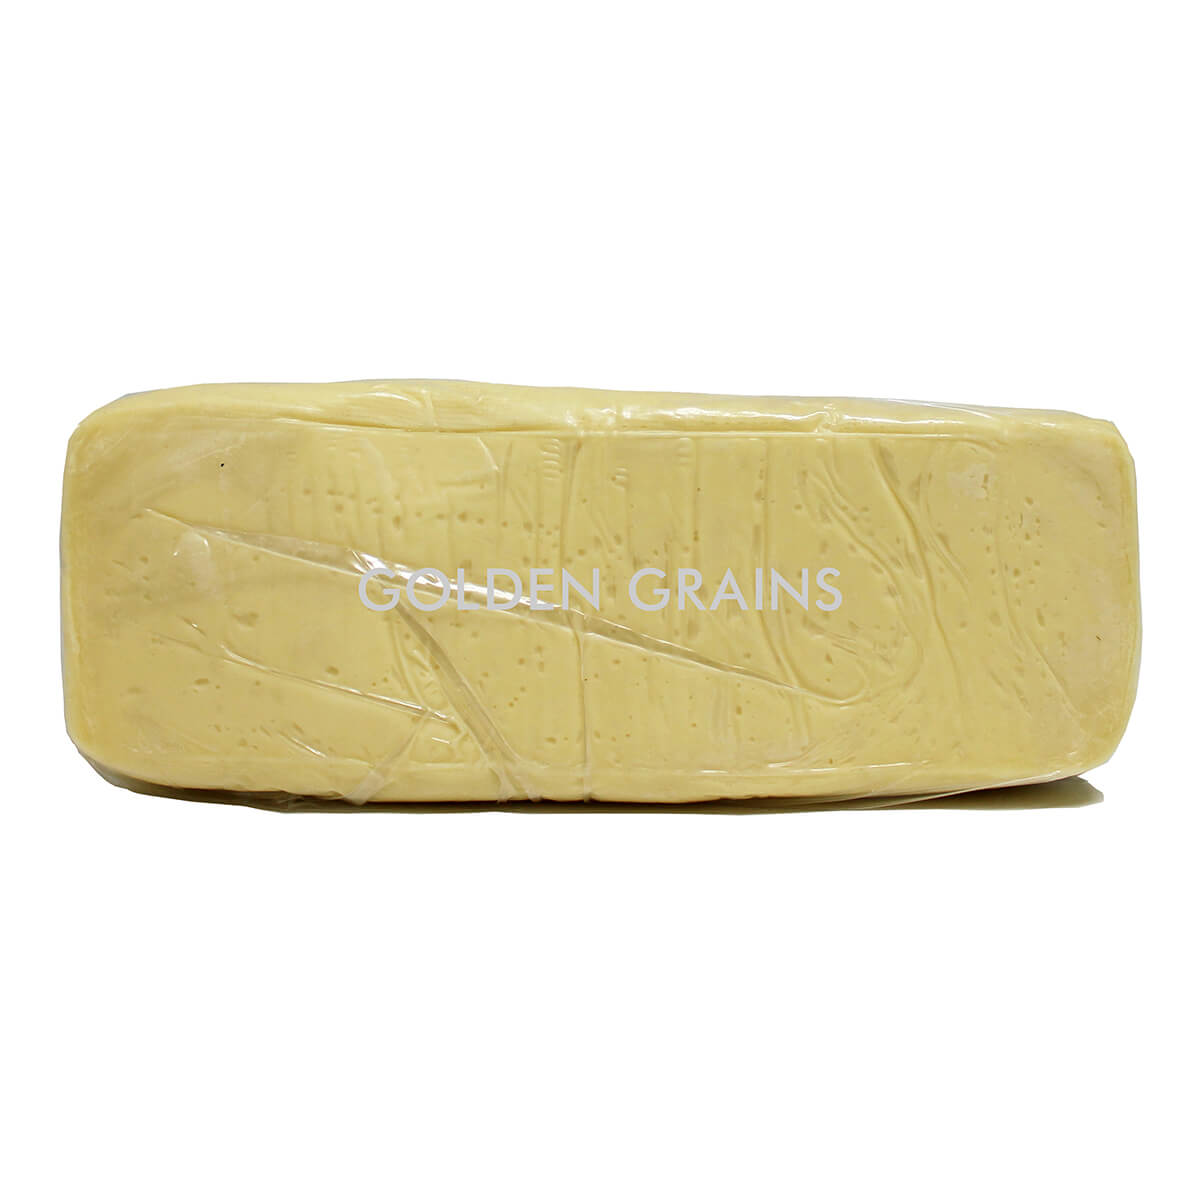 Golden Grains Goodbury - Edam Cheese - Back.jpg